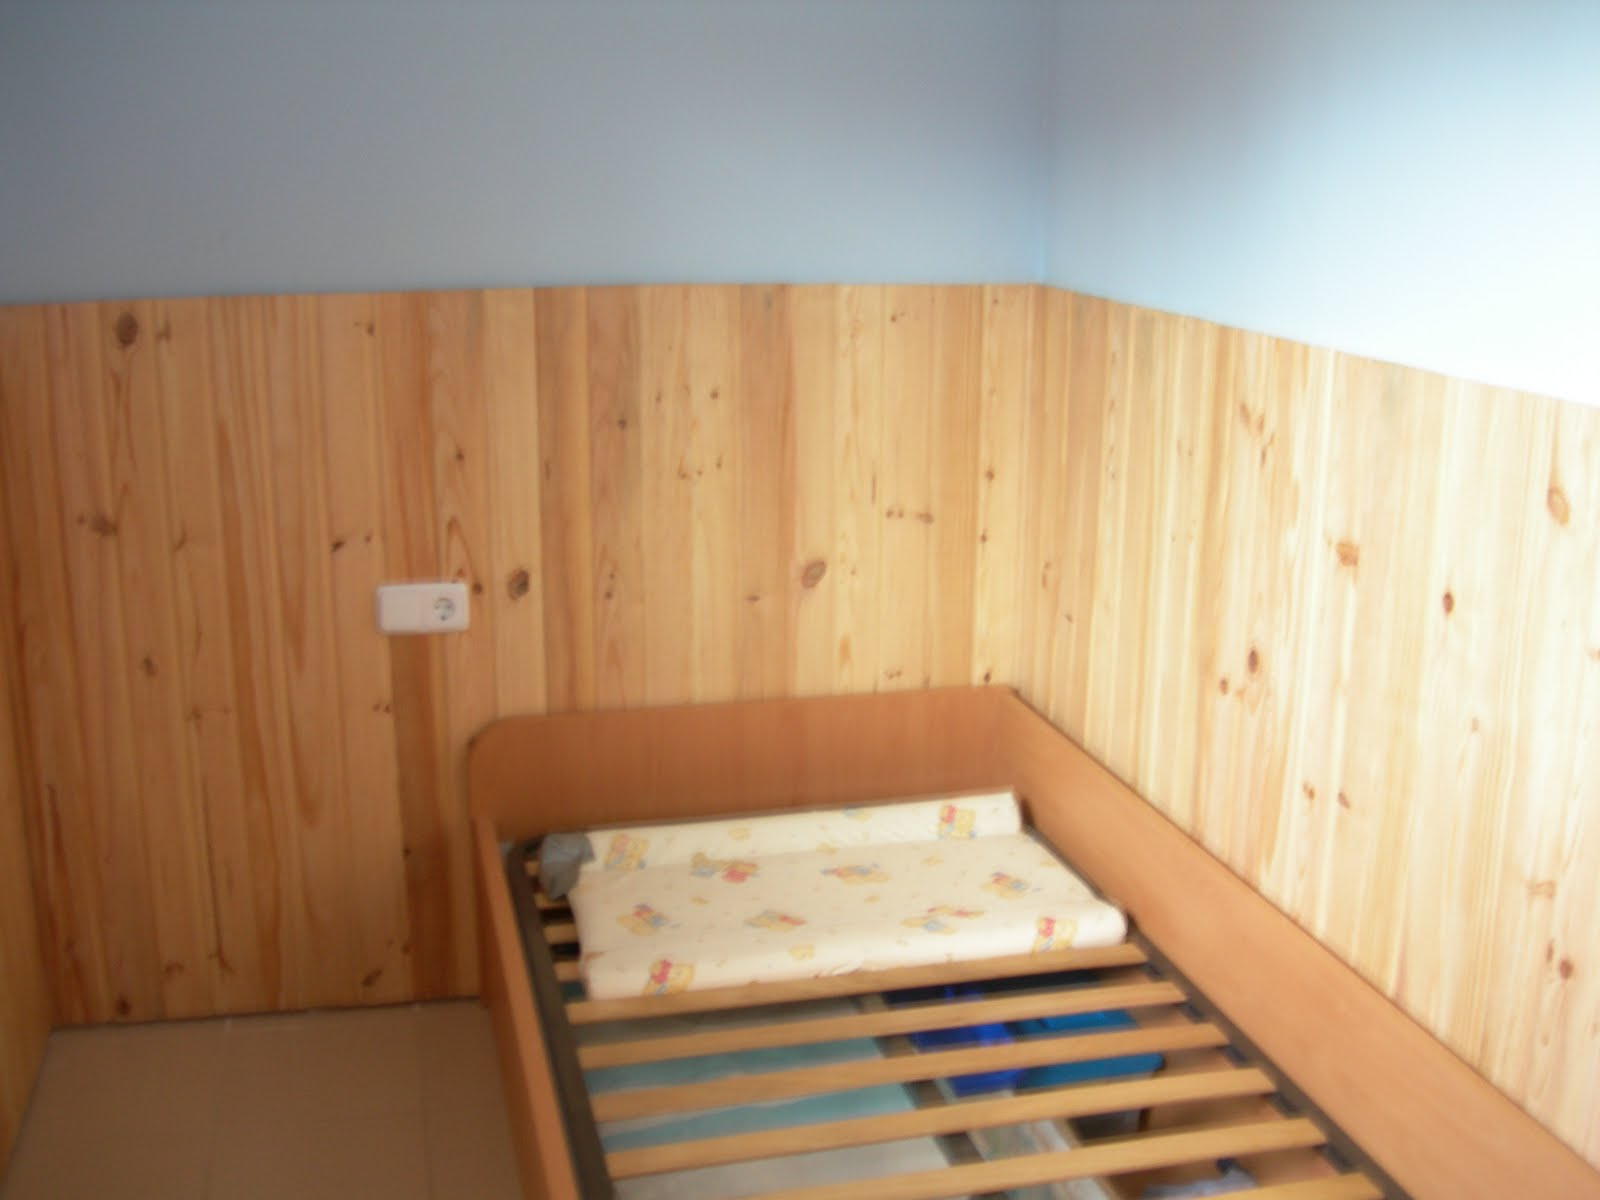 Bricolaje hazlo tu mismo colocar friso de madera for Friso madera pared